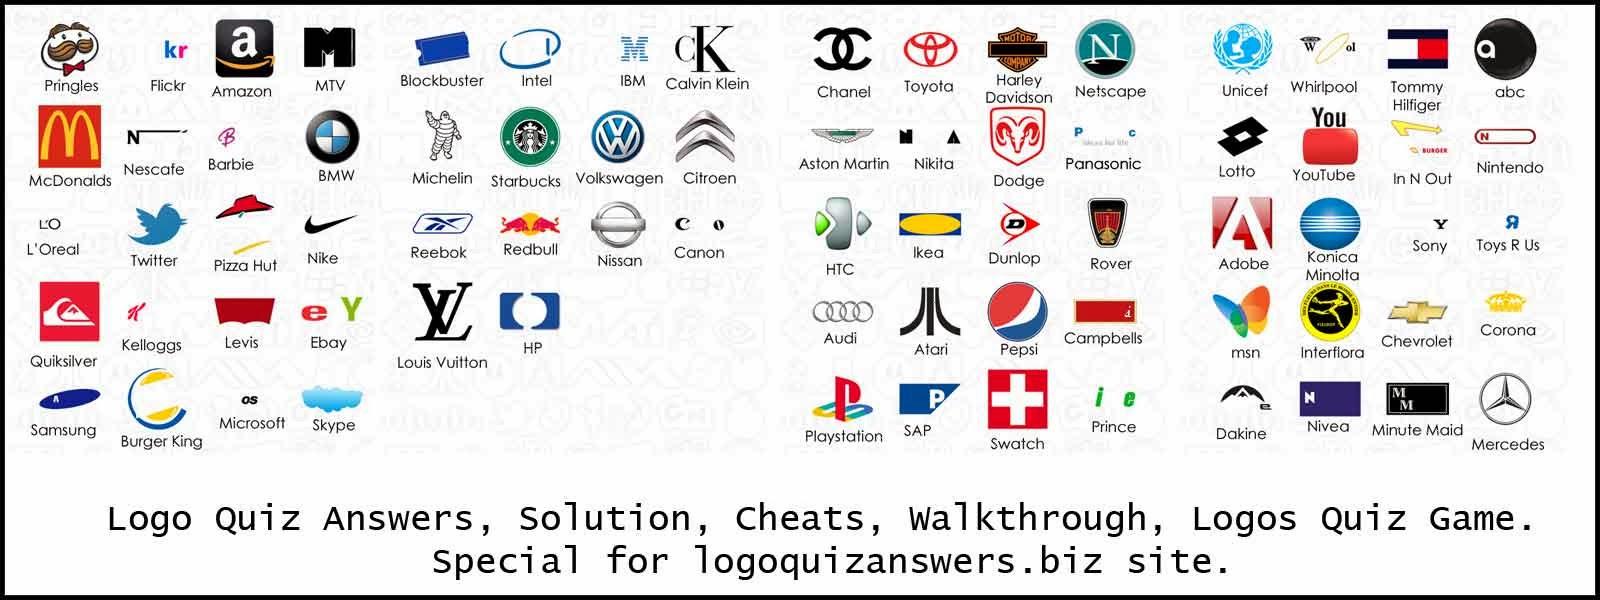 Logo quiz answers logo quiz solution logos quiz solutions logo quiz - Trend Logos Quiz Worlds Logo